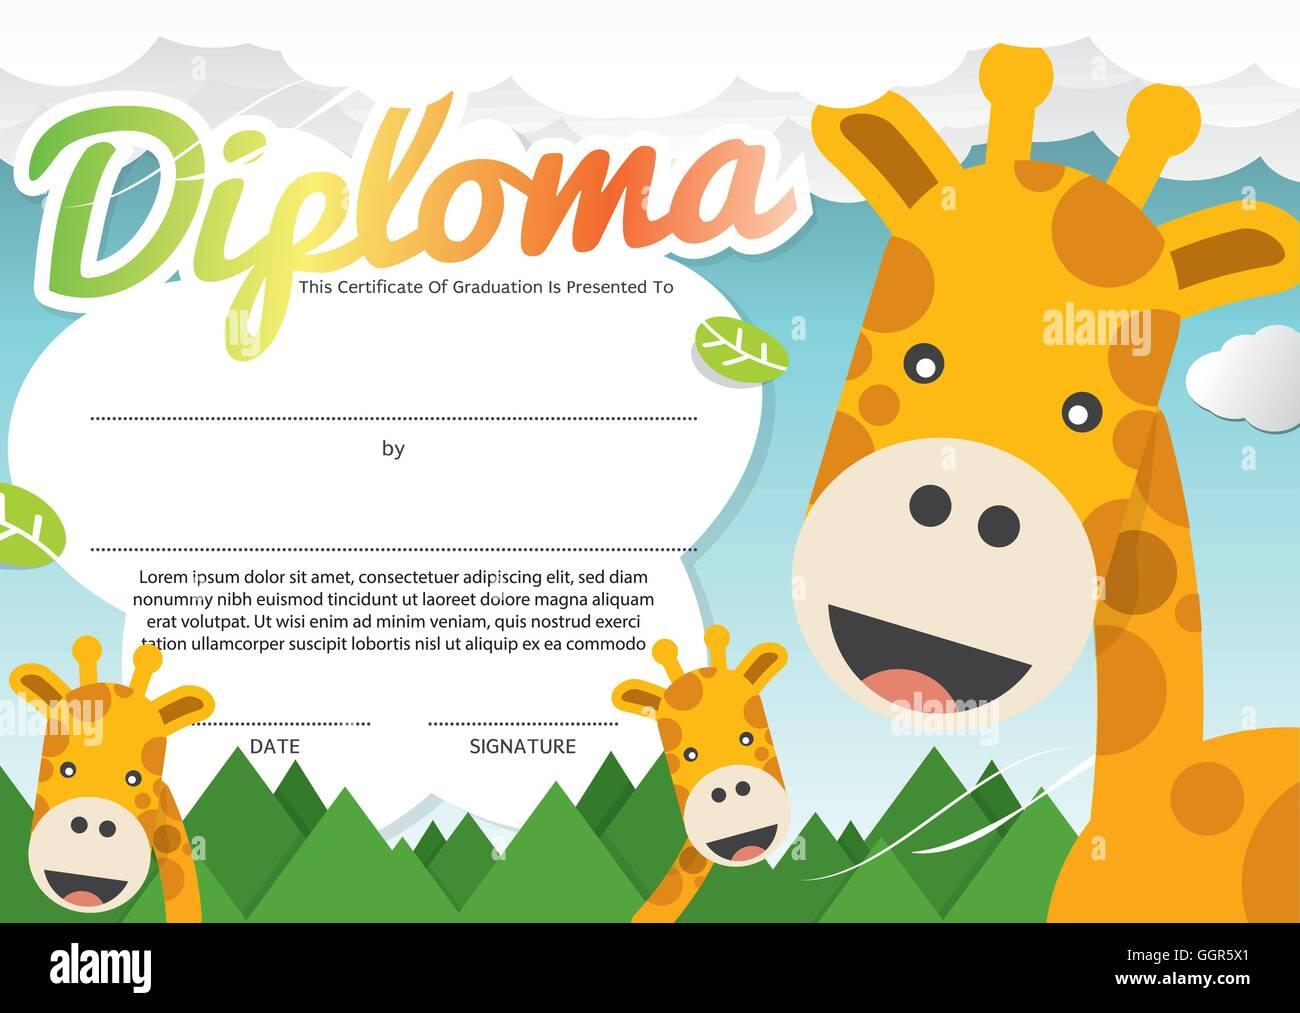 Kinder-Diplom-Zertifikat-Vorlage-Vektor-Illustration Vektor ...